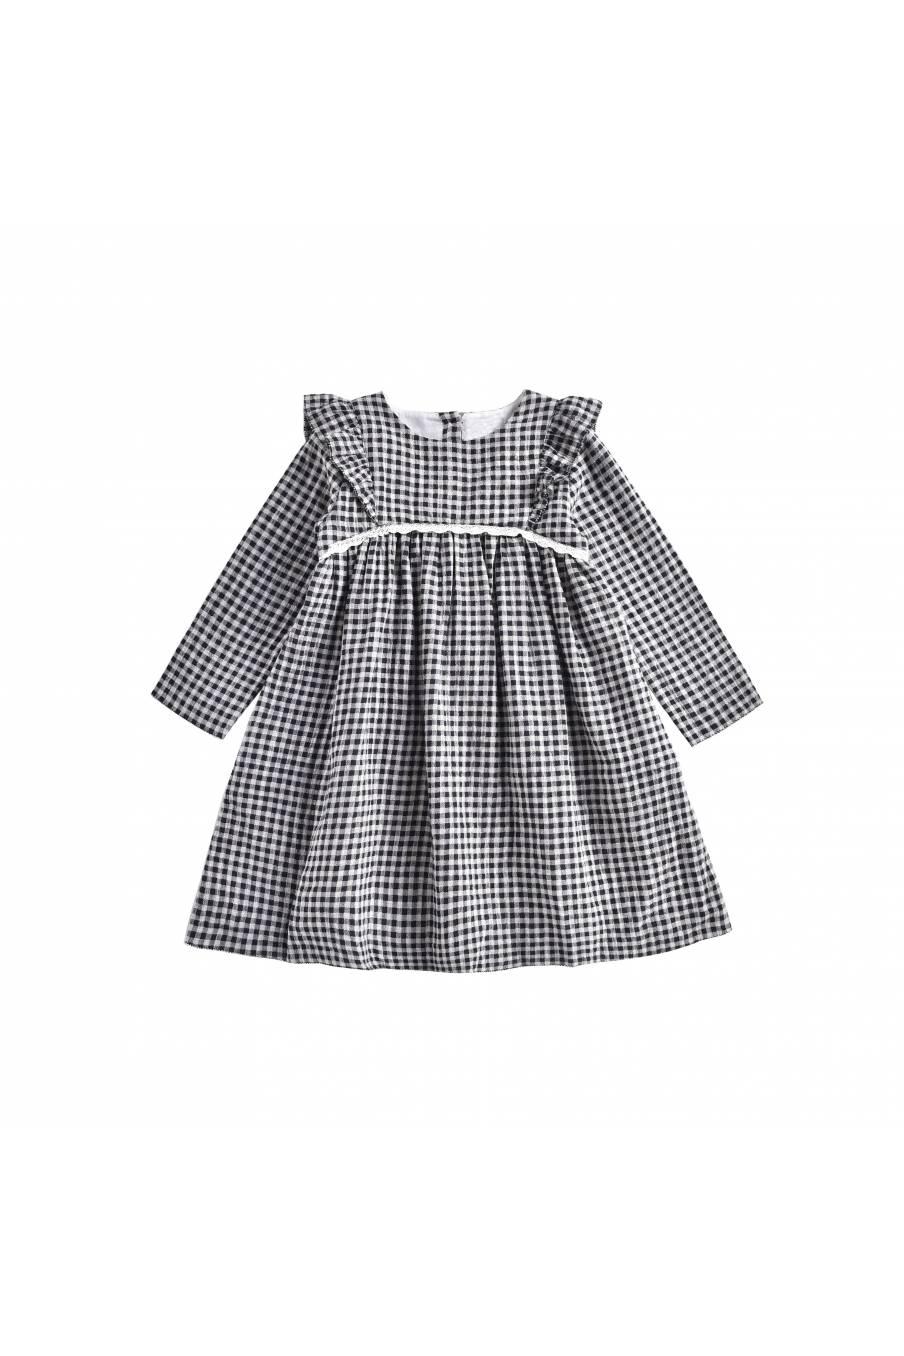 boheme chic vintage robe bébé fille alaka black vichy